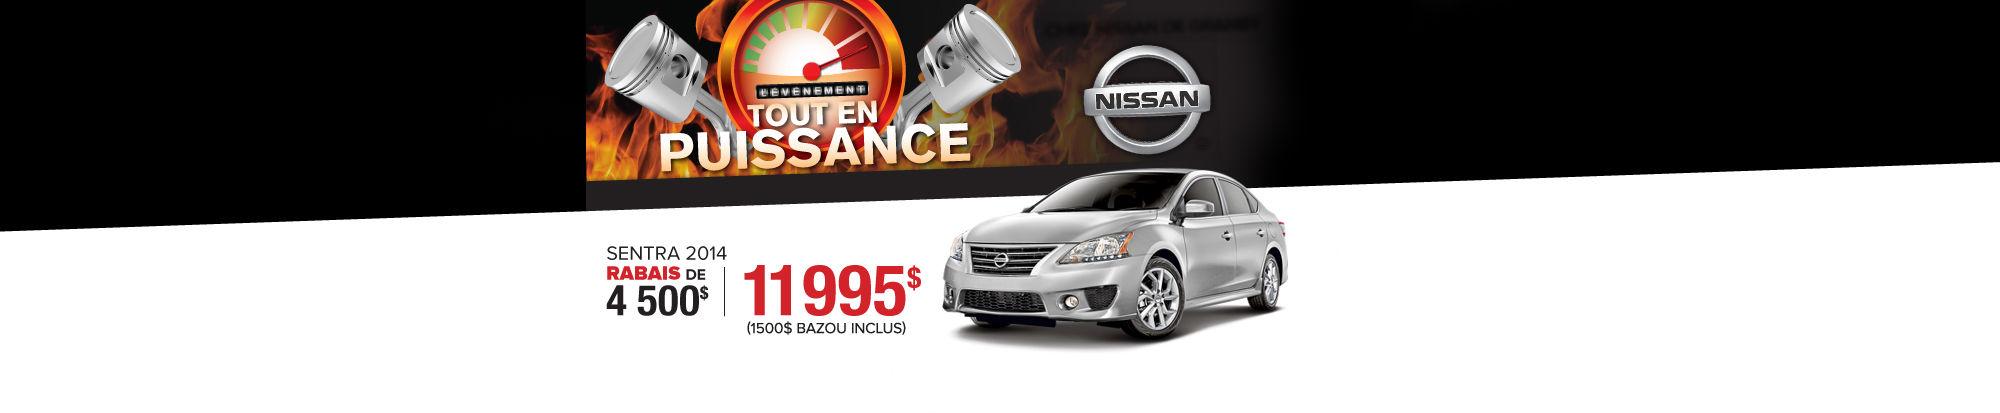 Nissan Sentra 2014 11 995$